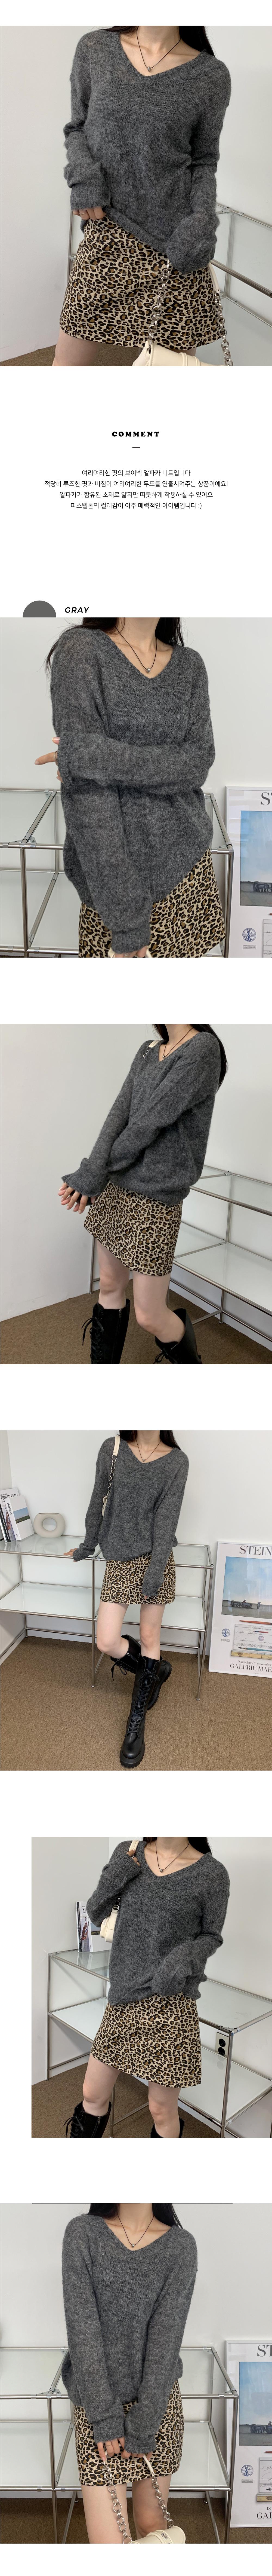 Mamon Alpaca V-Neck See-Through Knitwear